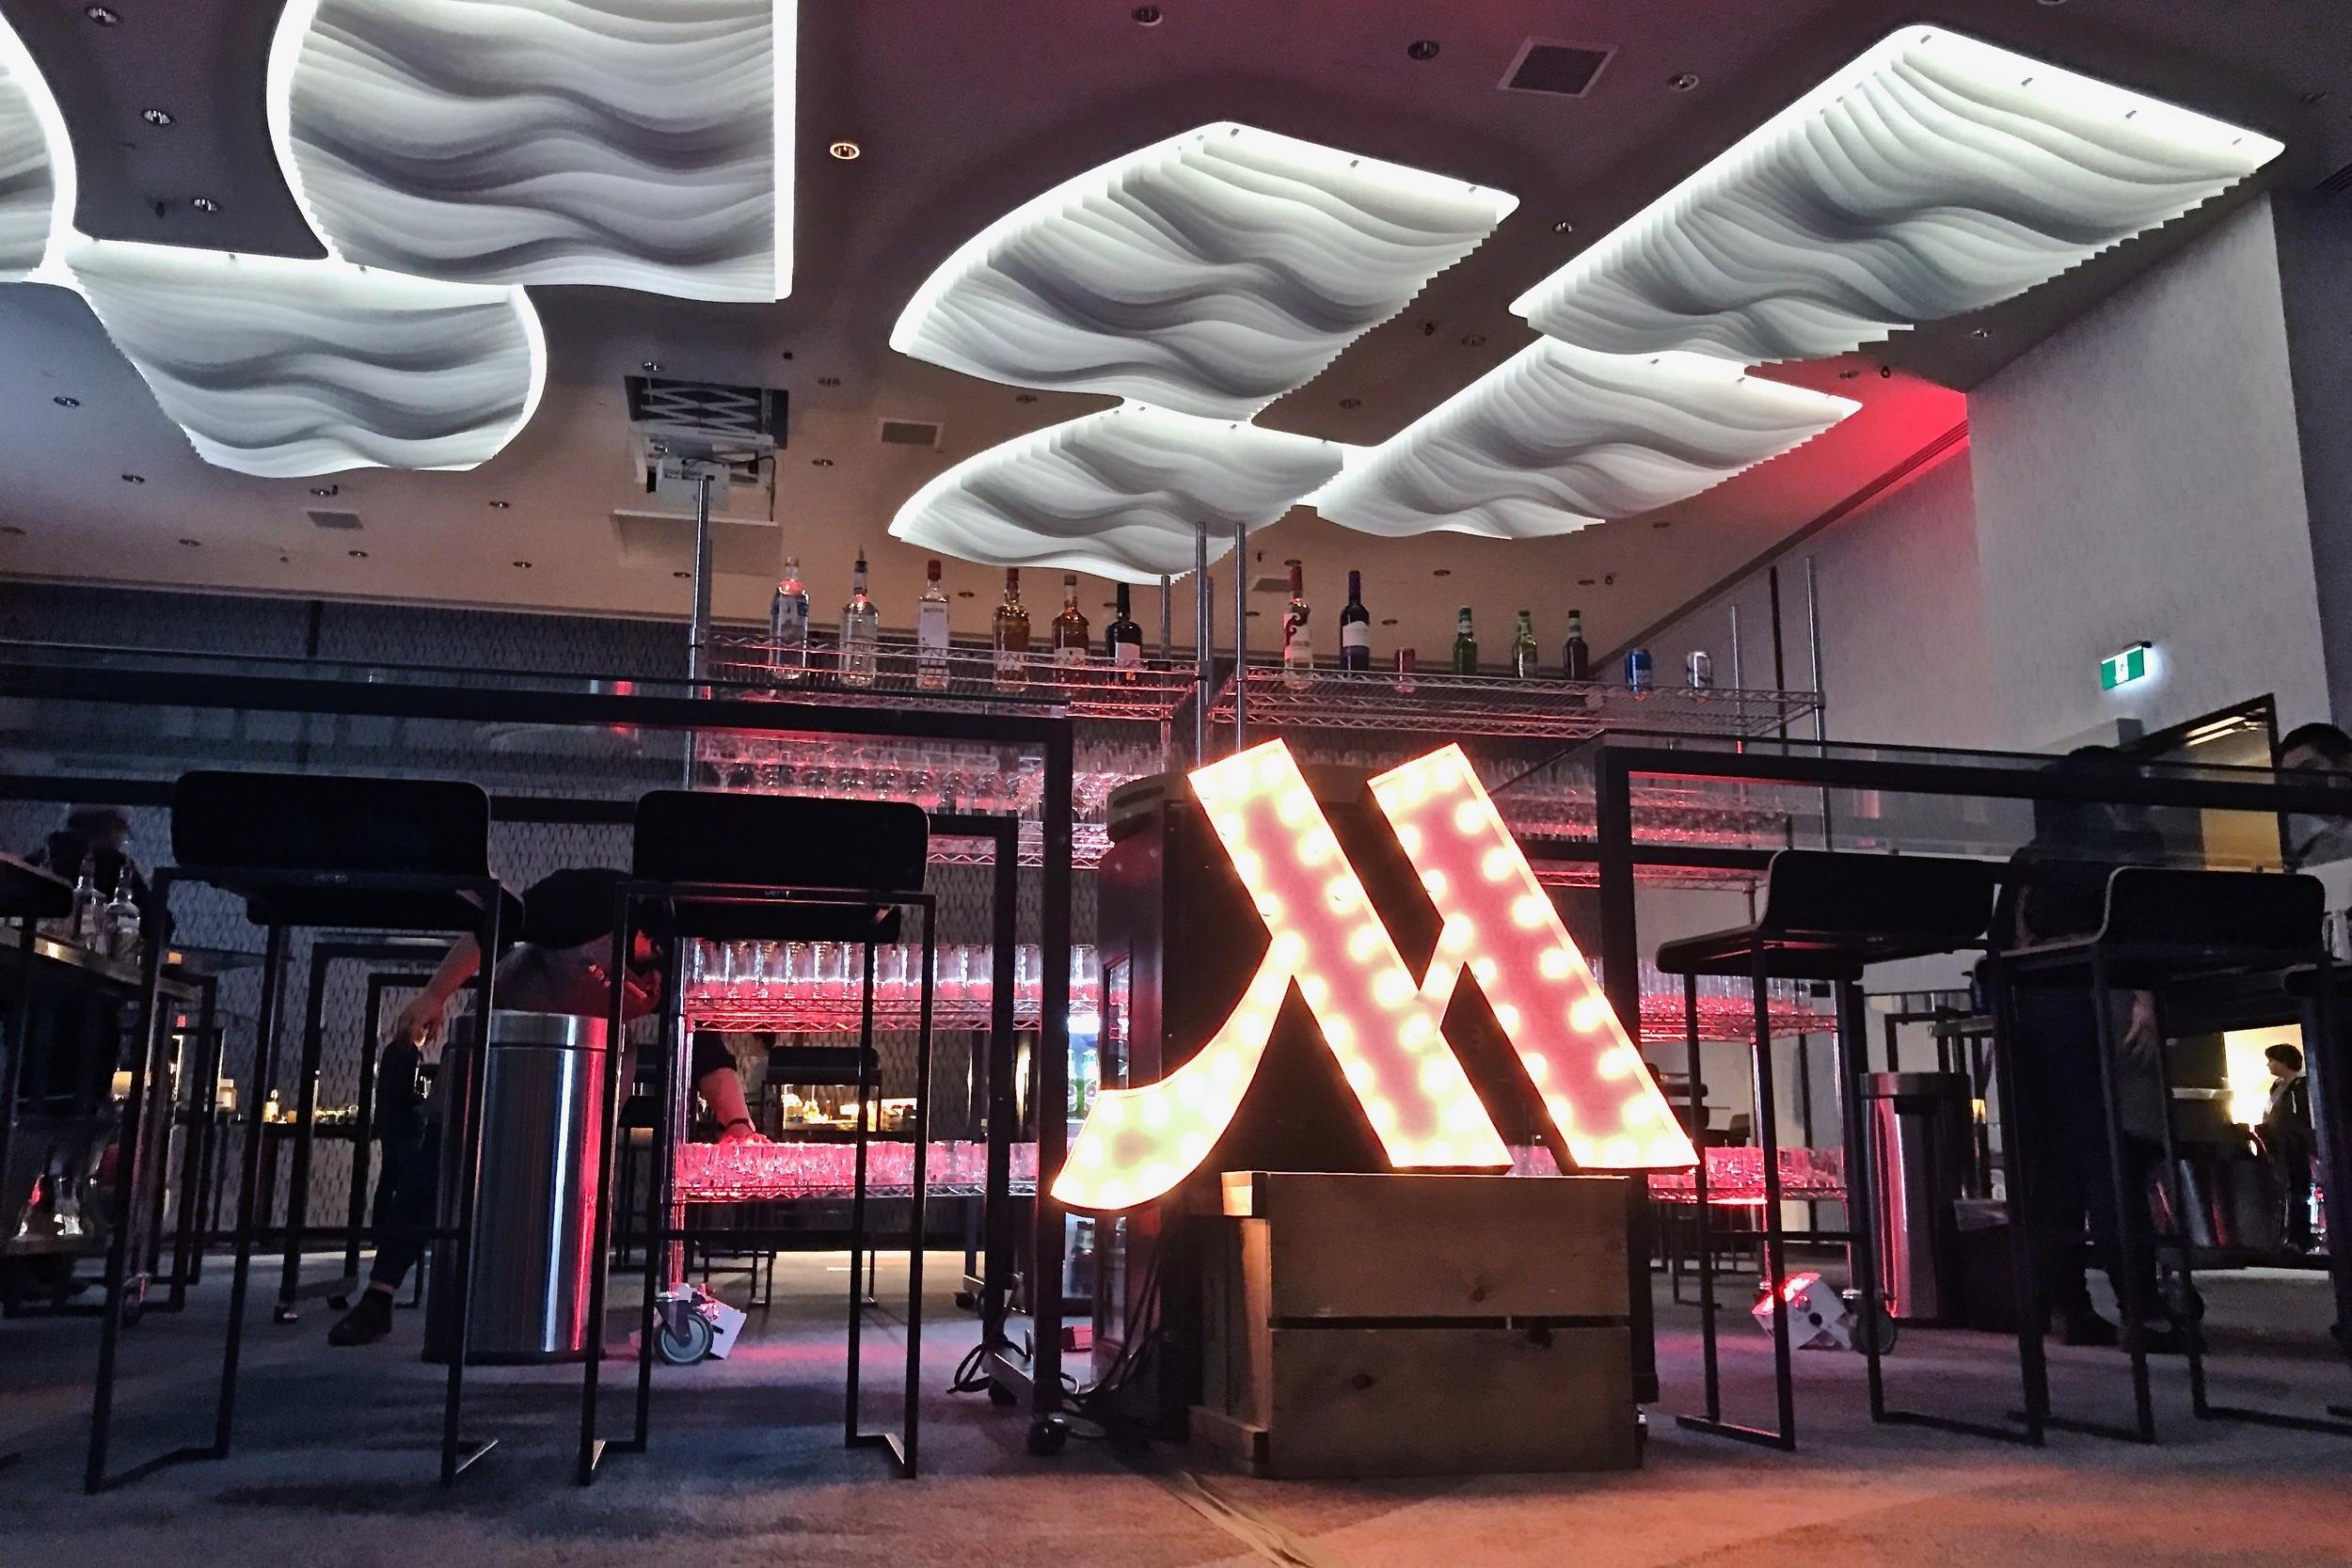 Last year's open bar, courtesy of the Marriott YYC